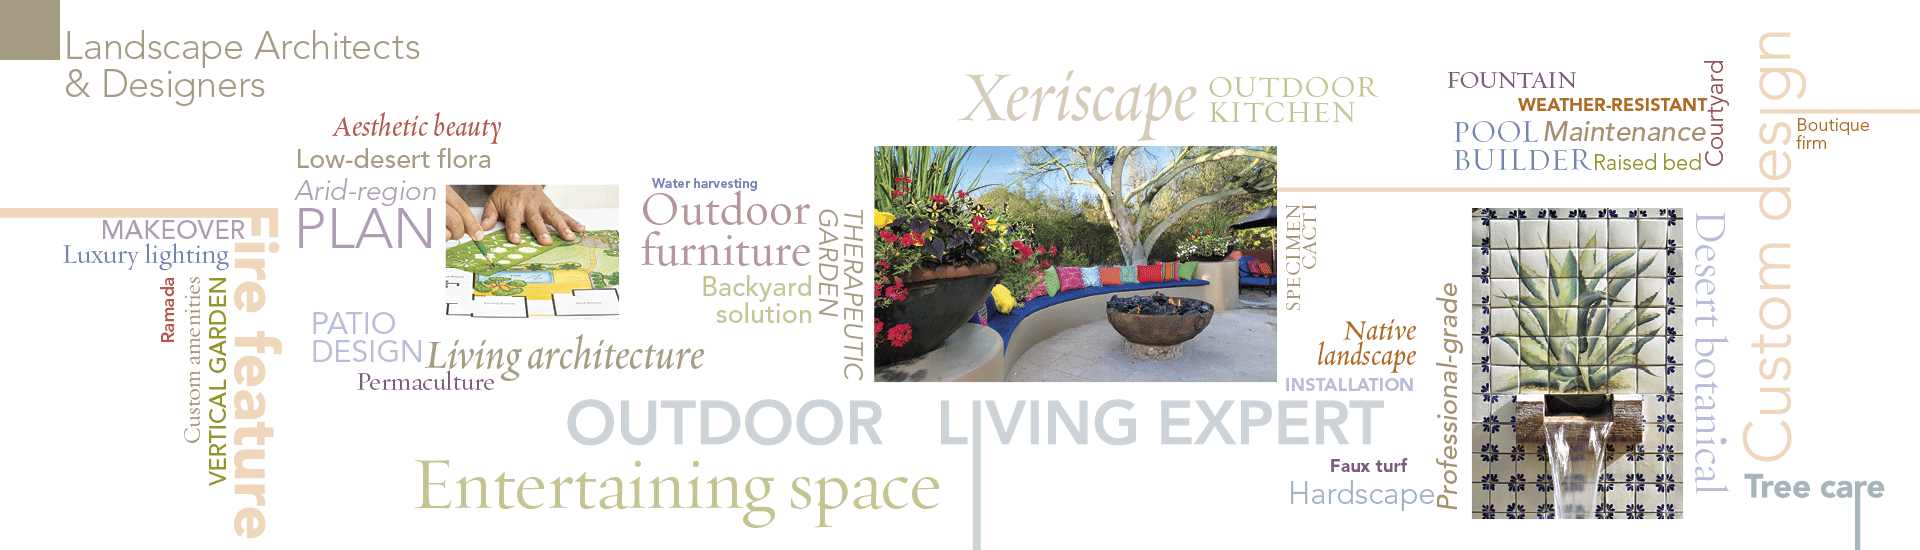 Landscape Architects & Designers